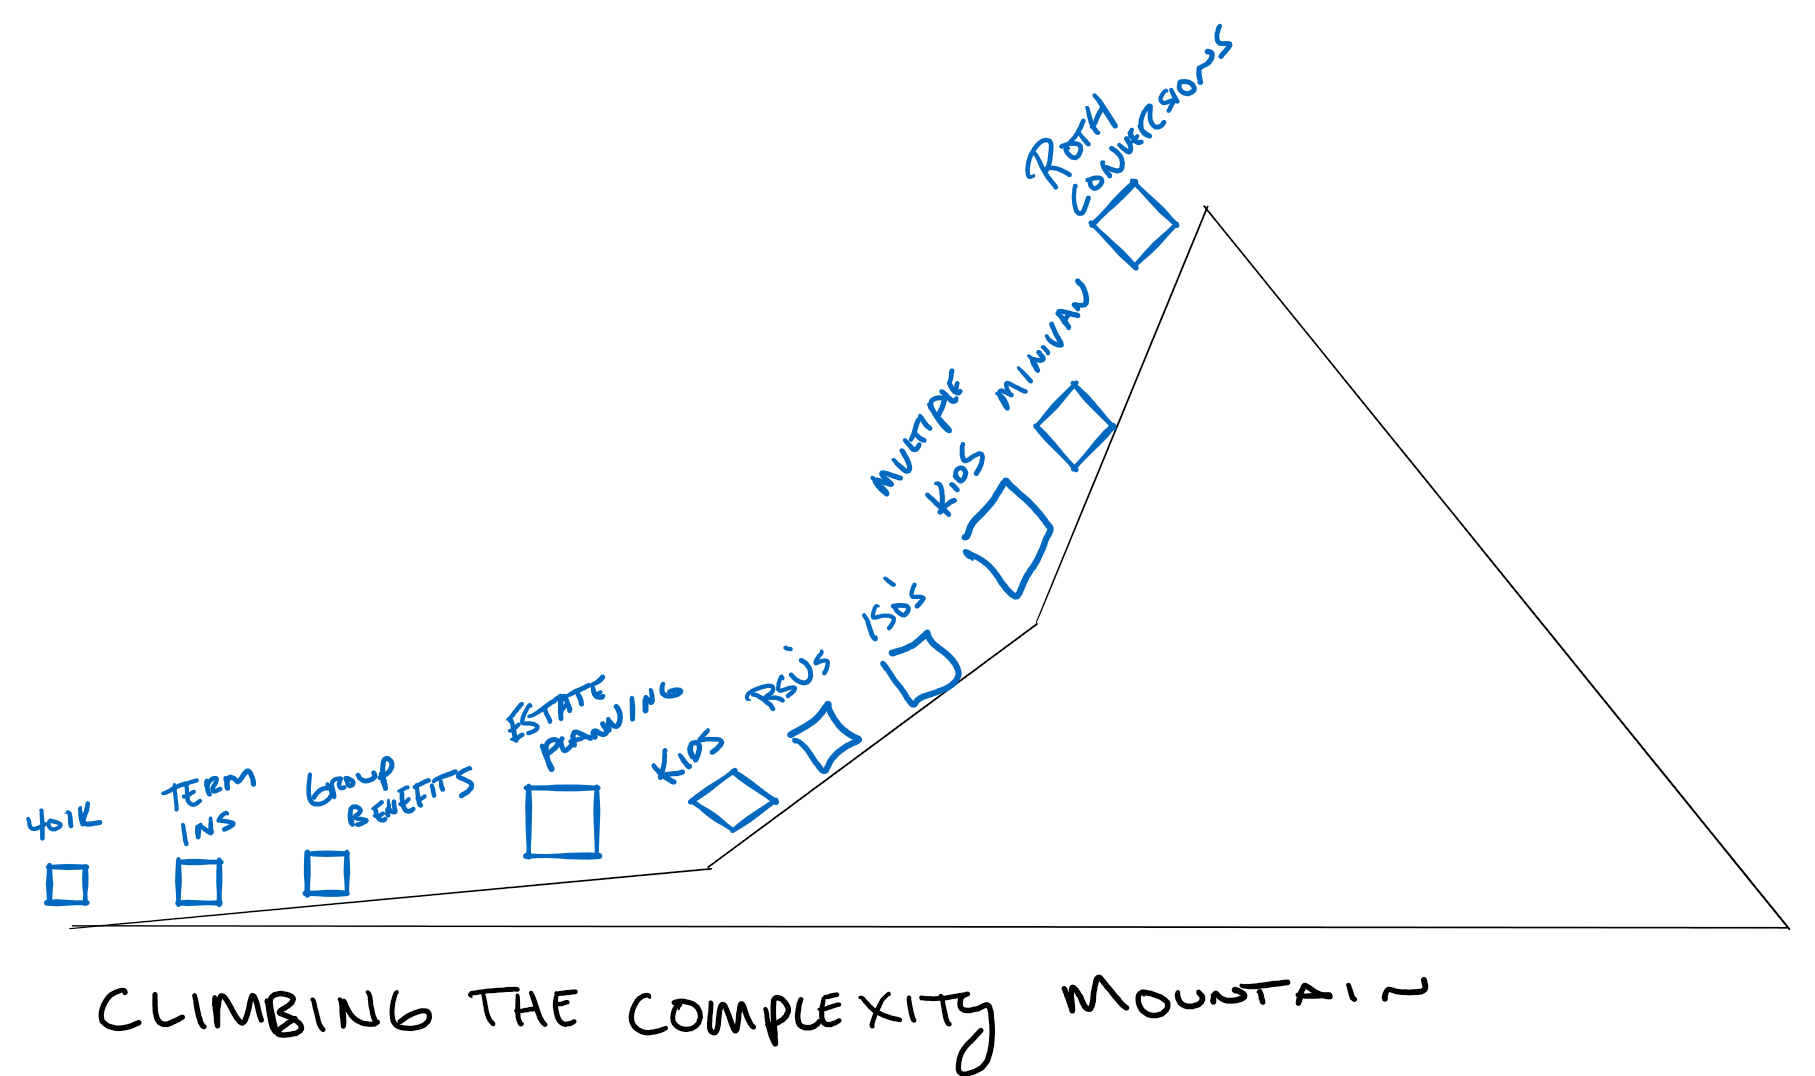 complexity mountain